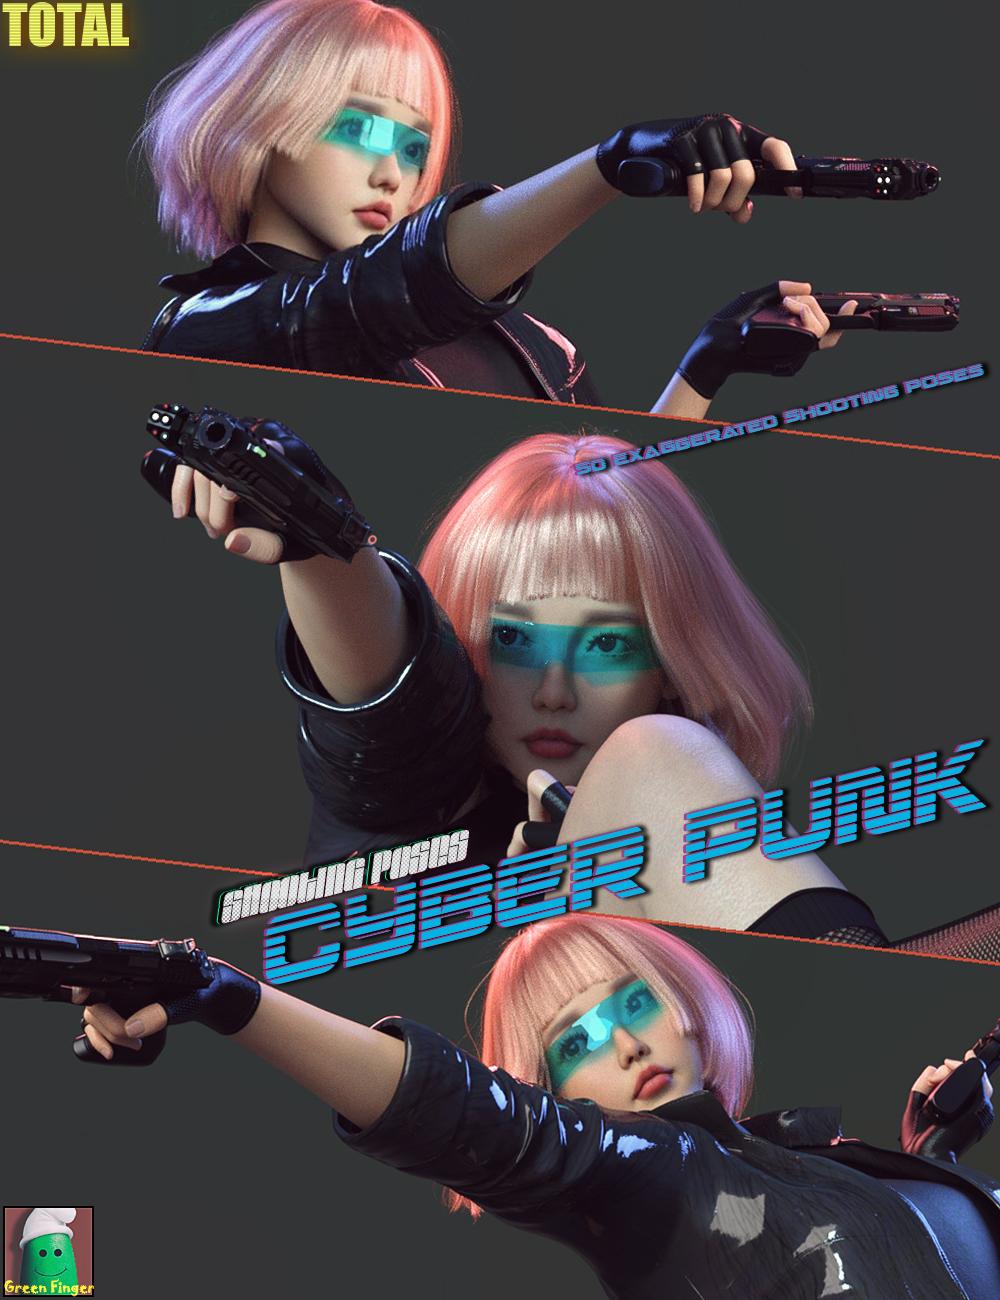 GF Total CPP Shooting Poses for Genesis 8 Females by: Nirvana, 3D Models by Daz 3D